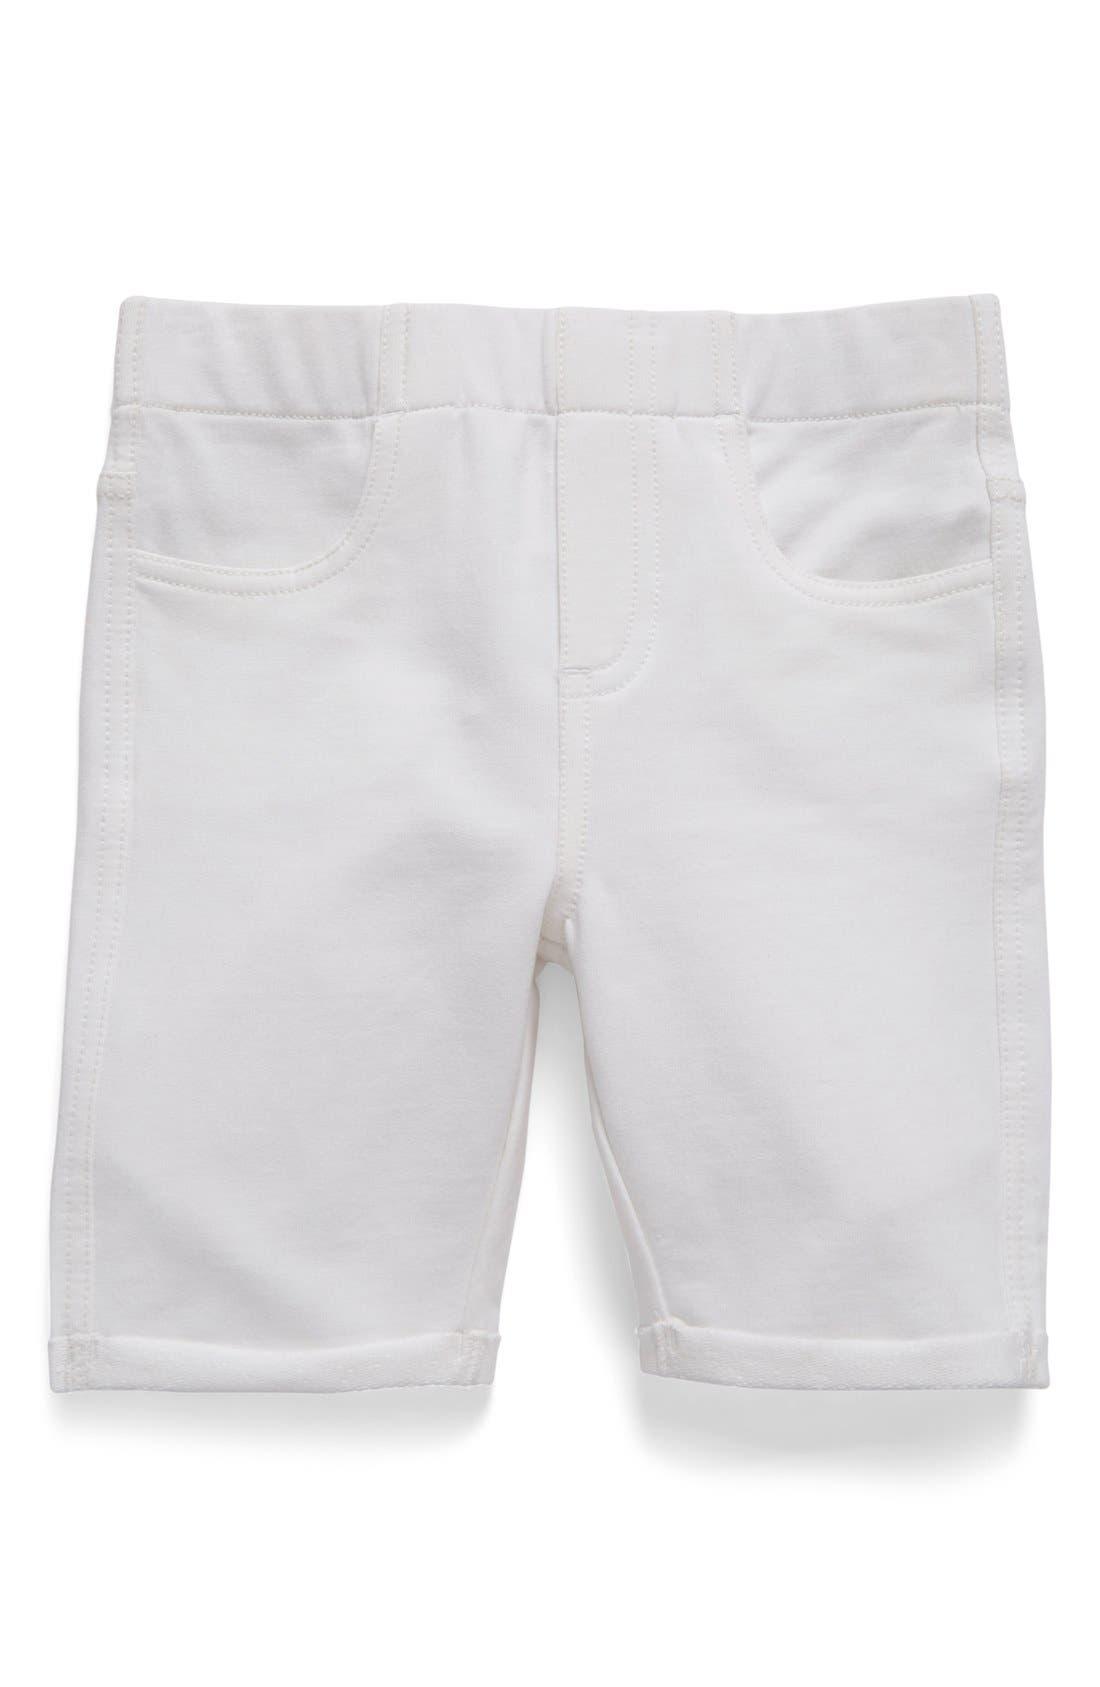 Alternate Image 1 Selected - Tucker + Tate 'Jenna' Jegging Shorts (Little Girls & Big Girls)